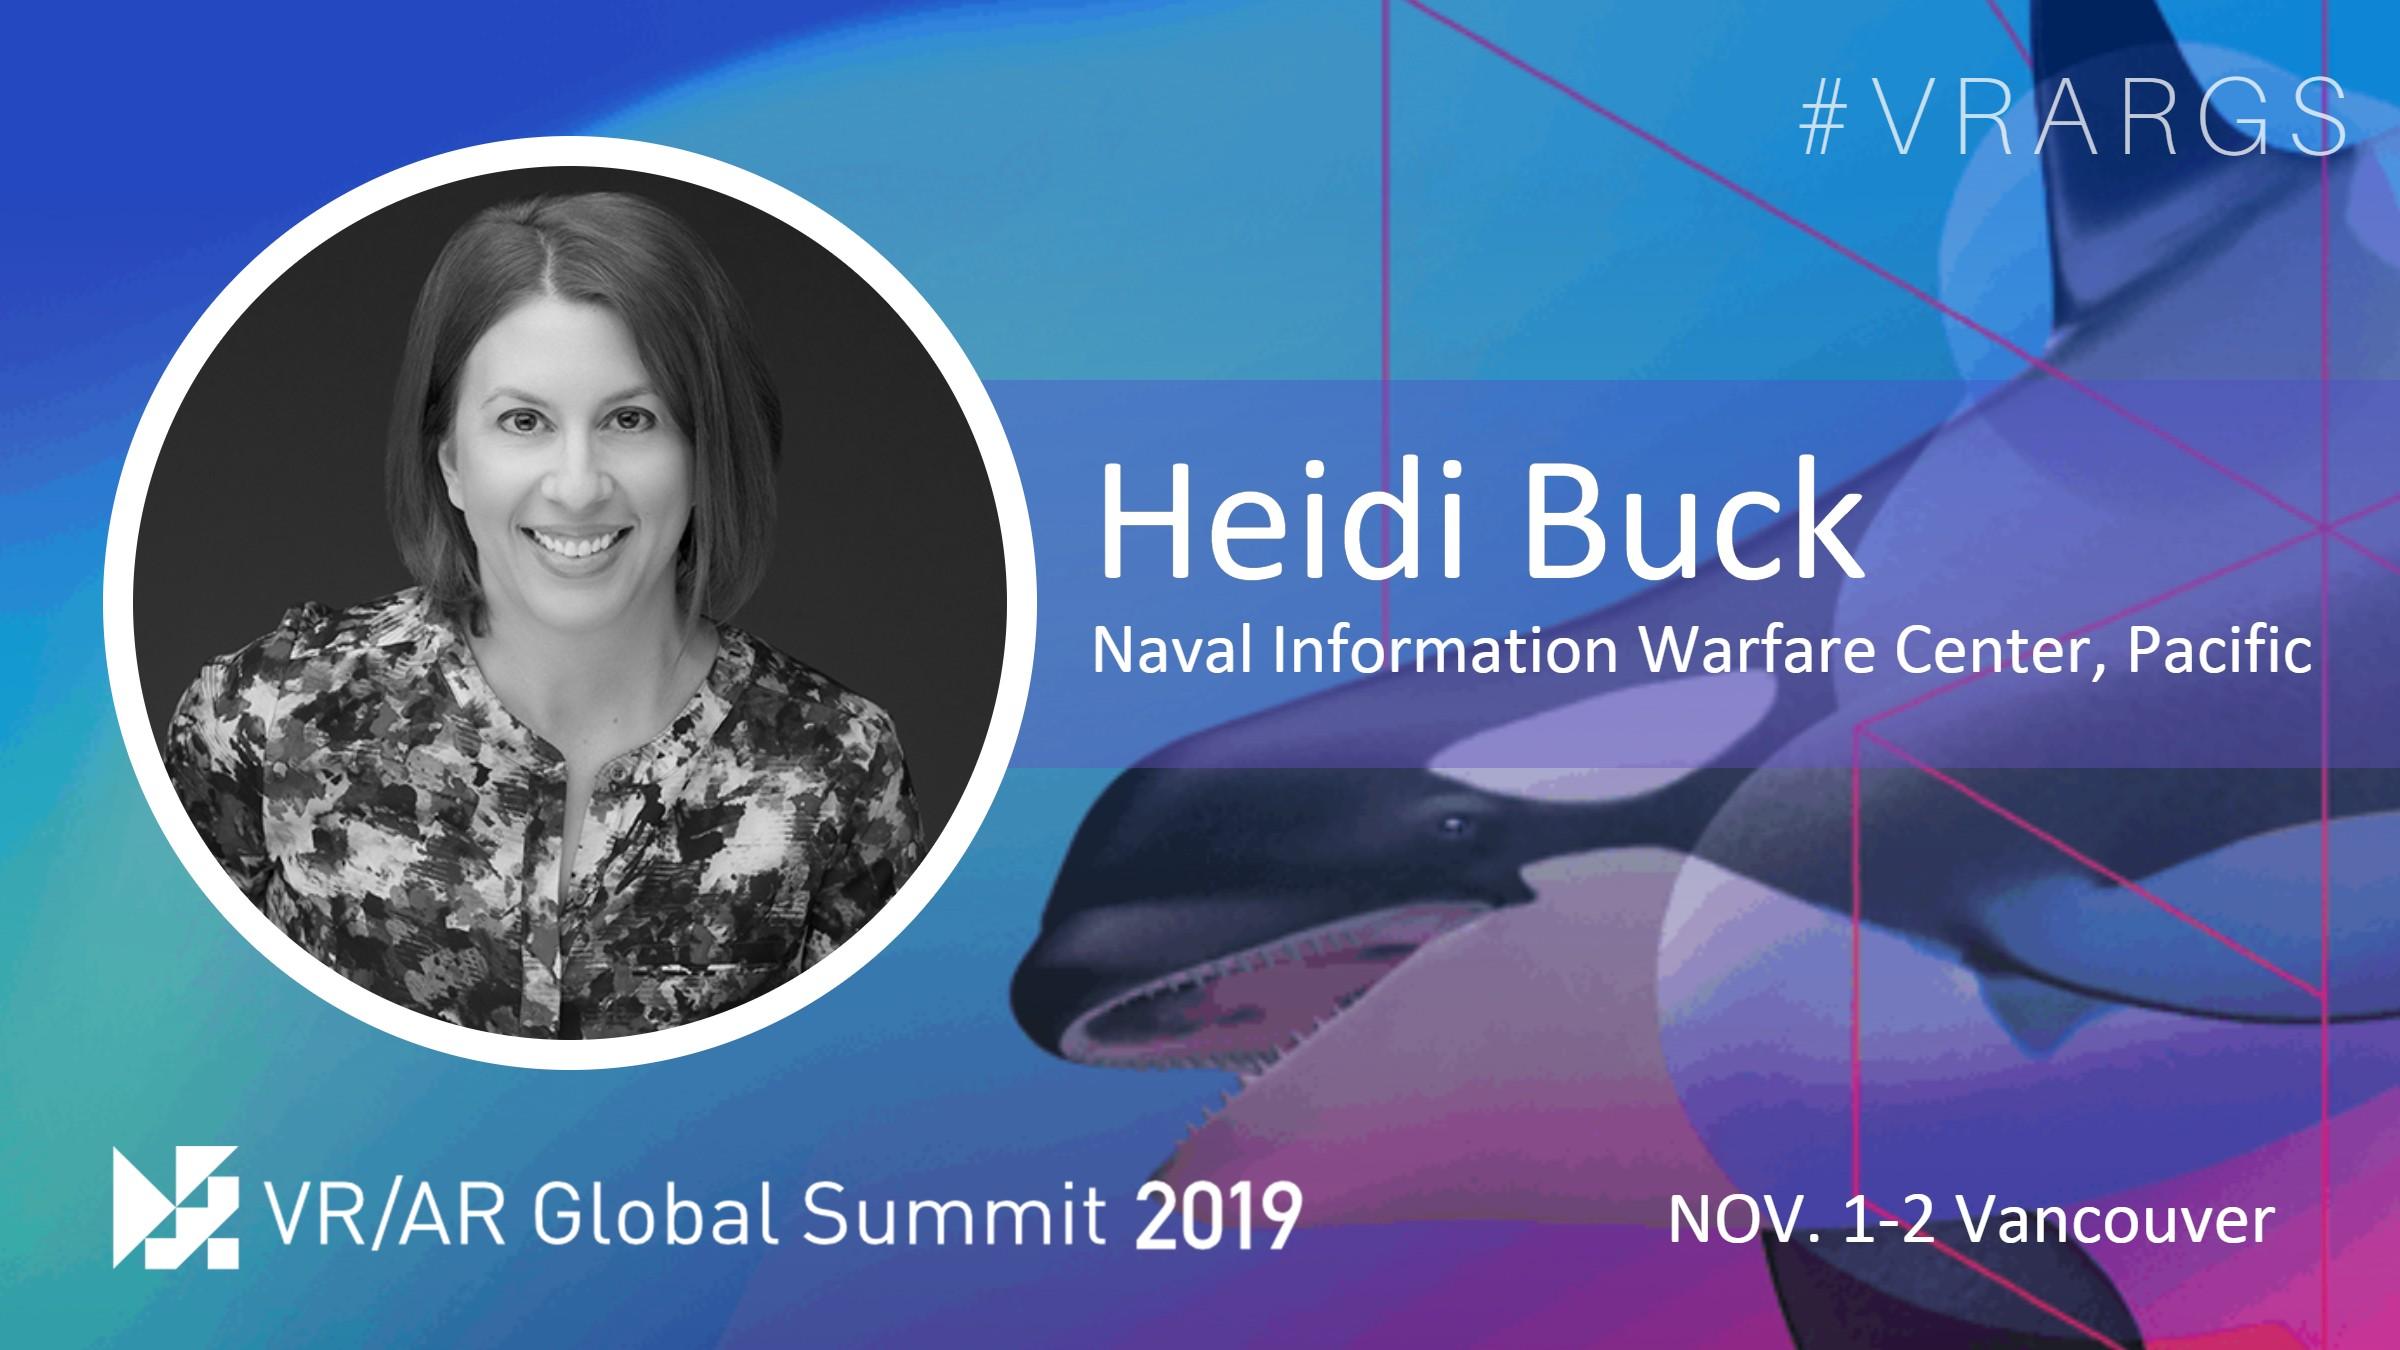 HighRes-Heidi-Buck-Naval-Information-Warfare-Center-Pacific-VRARGS-VRAR-Global-Summit-Spatial-Computing-Vancouver.jpg